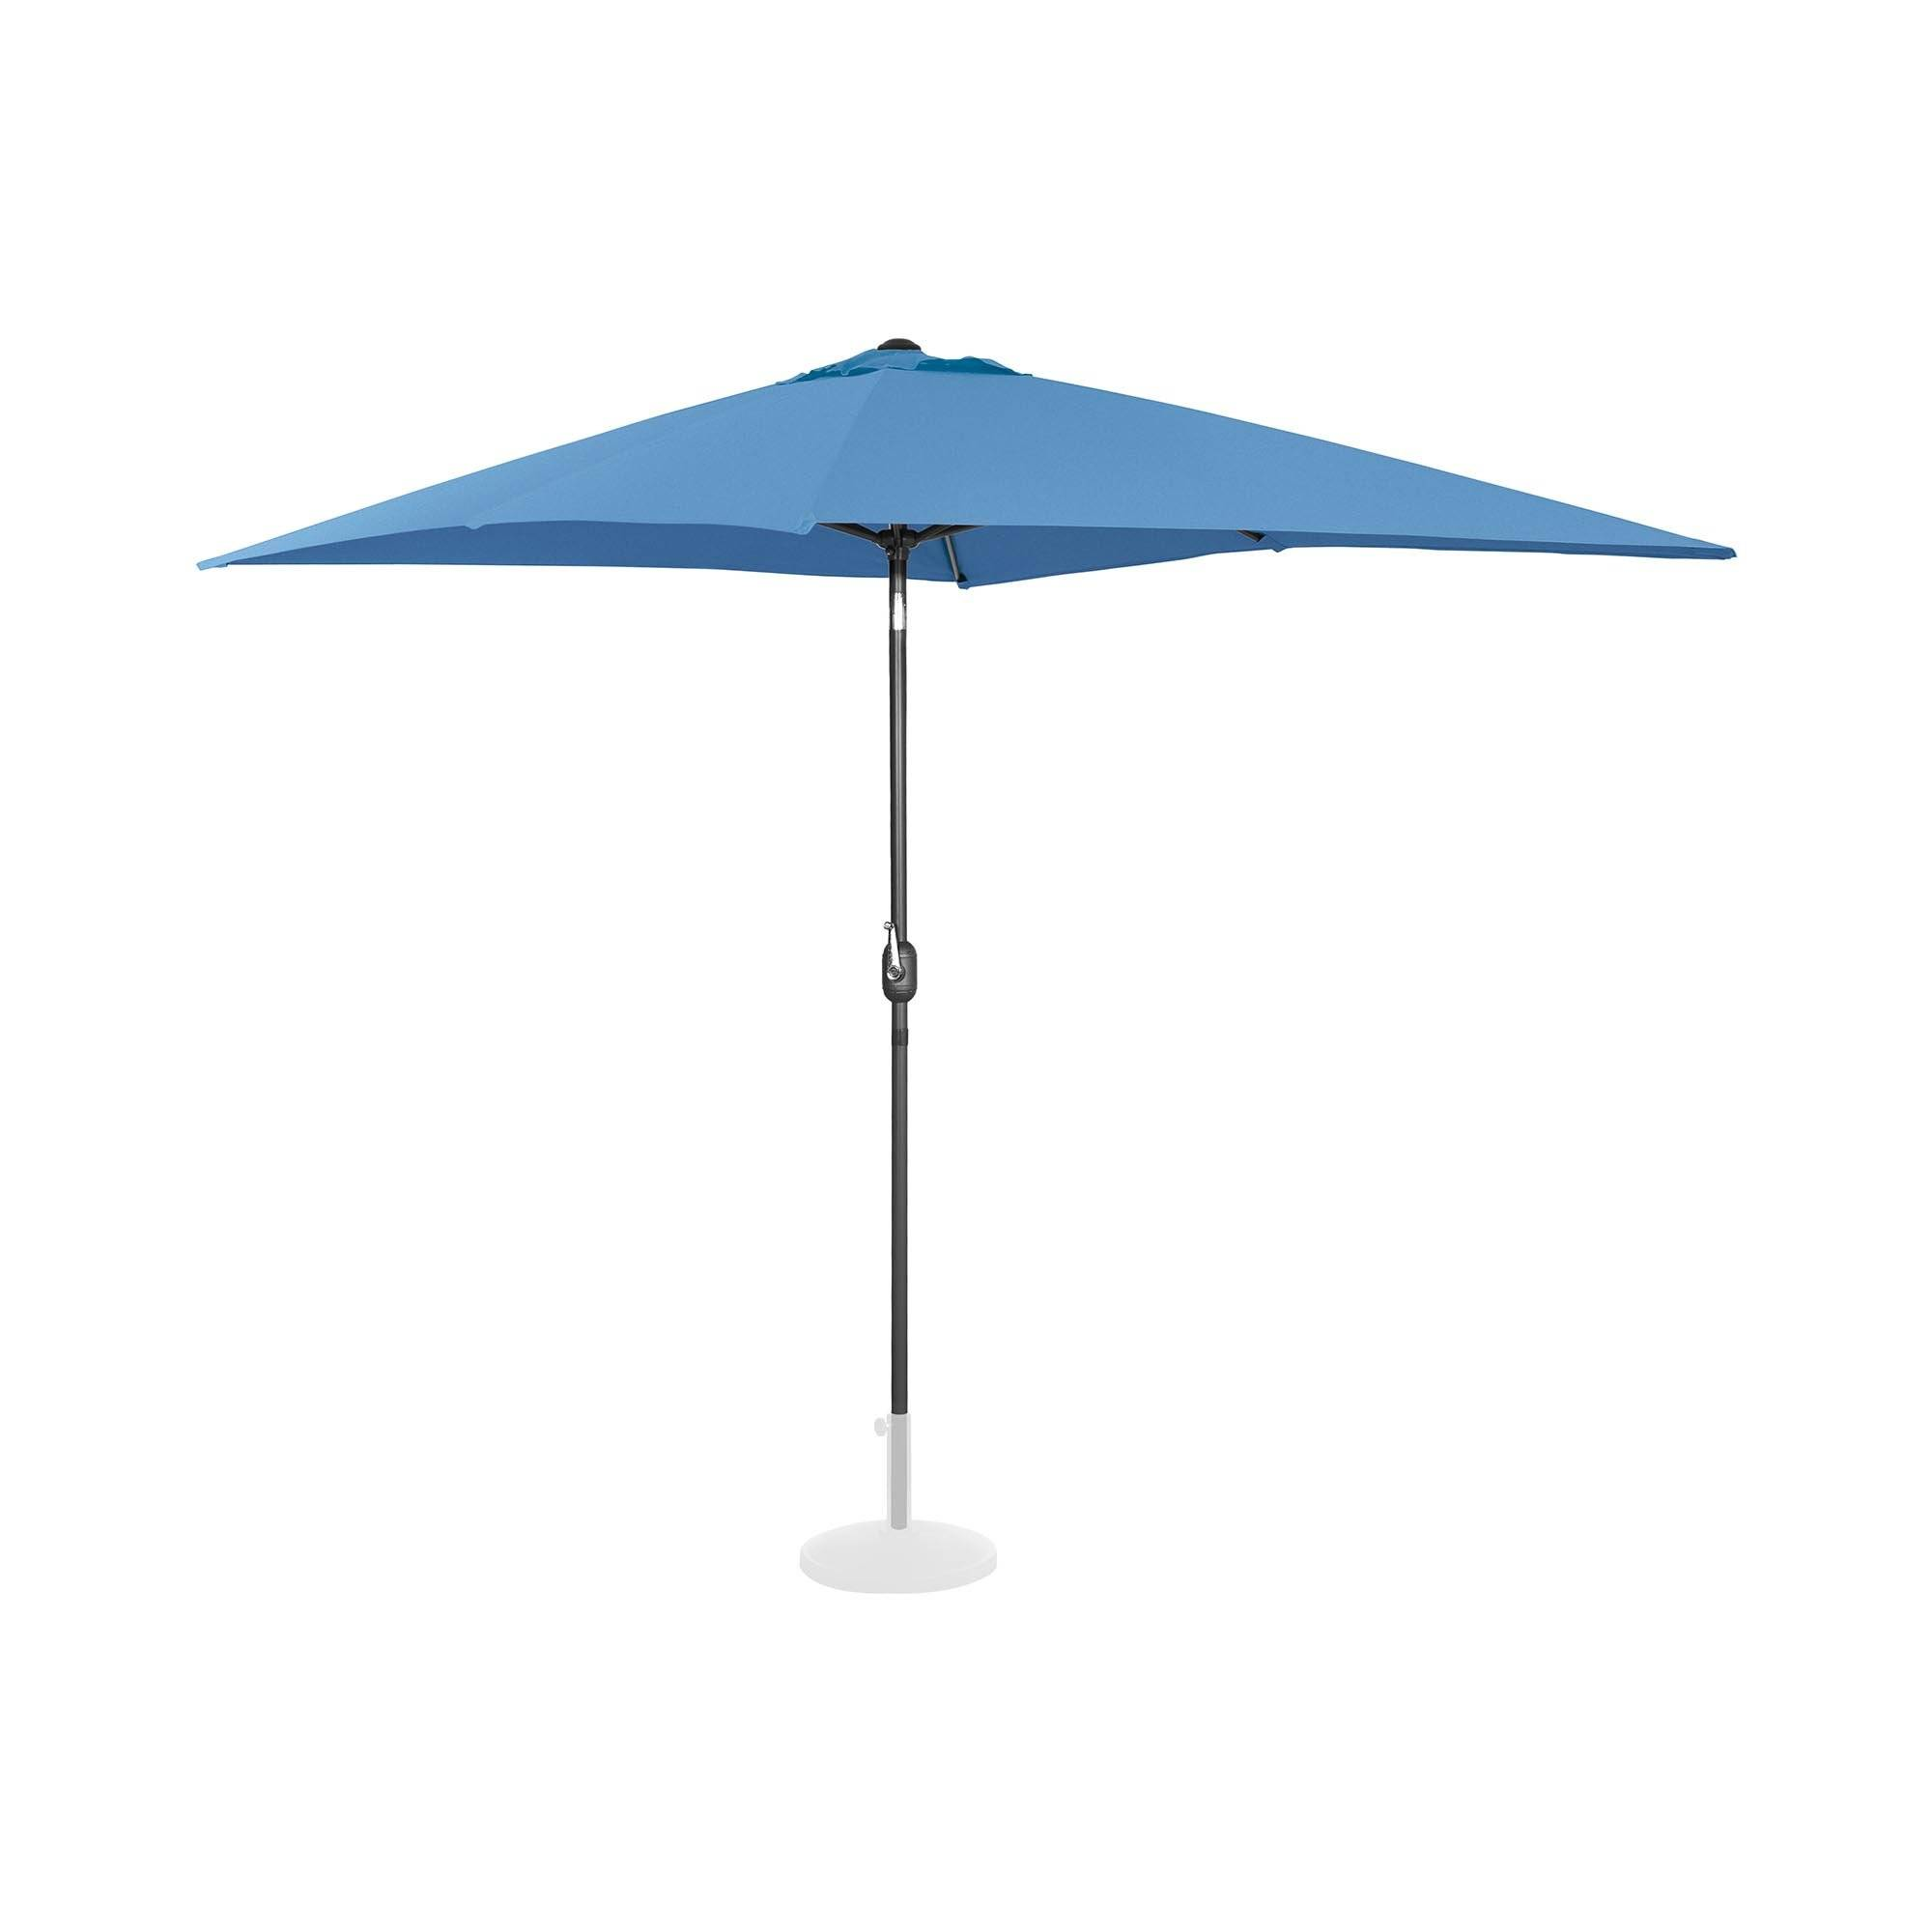 Uniprodo Parasol - blå - rektangulær - 200 x 300 cm - knæk-position UNI_UMBRELLA_TSQ2030BL